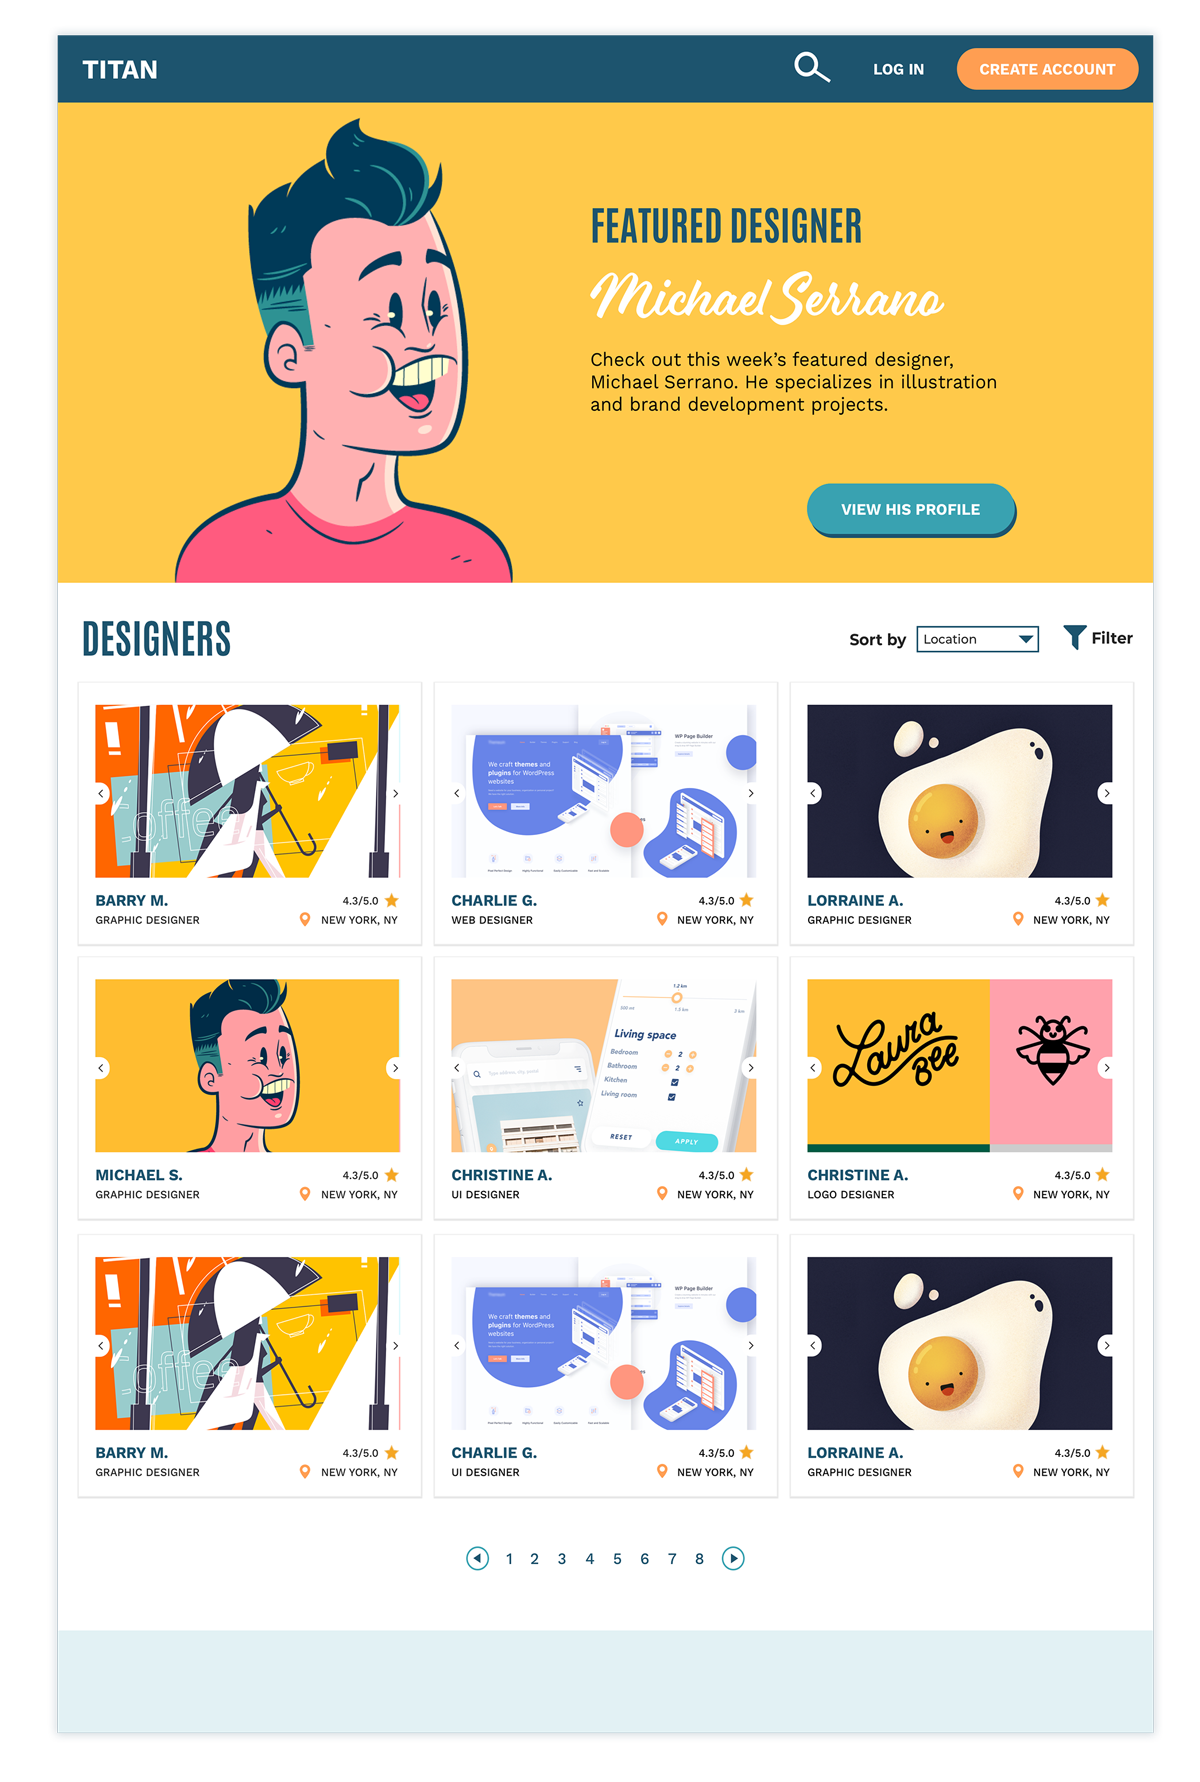 Designer-Listing---Logged-In_web.png